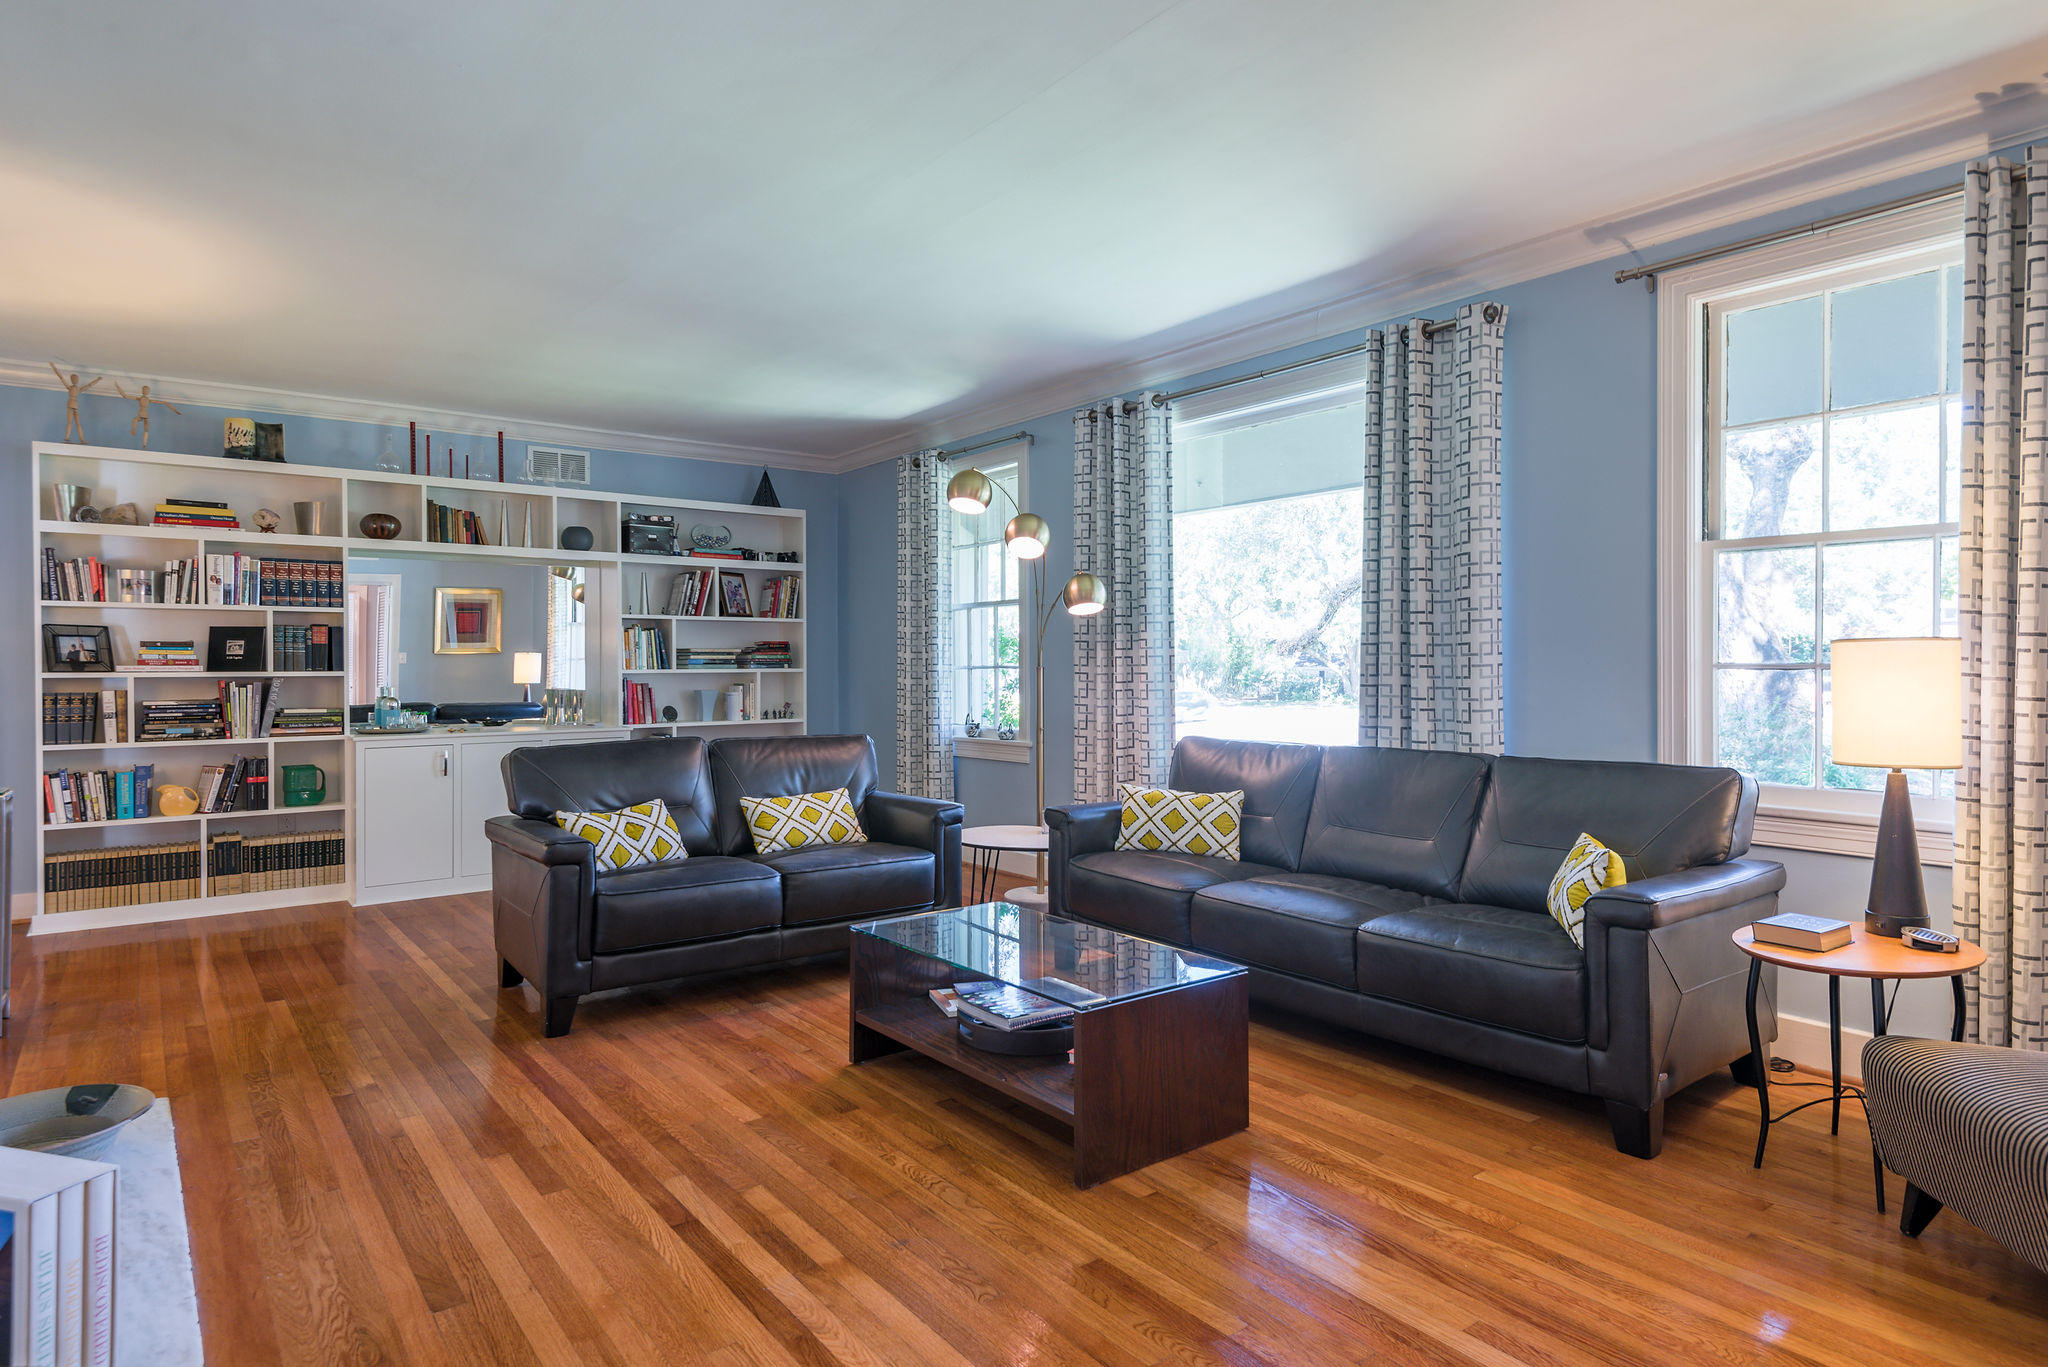 Sylvan Shores Homes For Sale - 450 Polony, Charleston, SC - 5